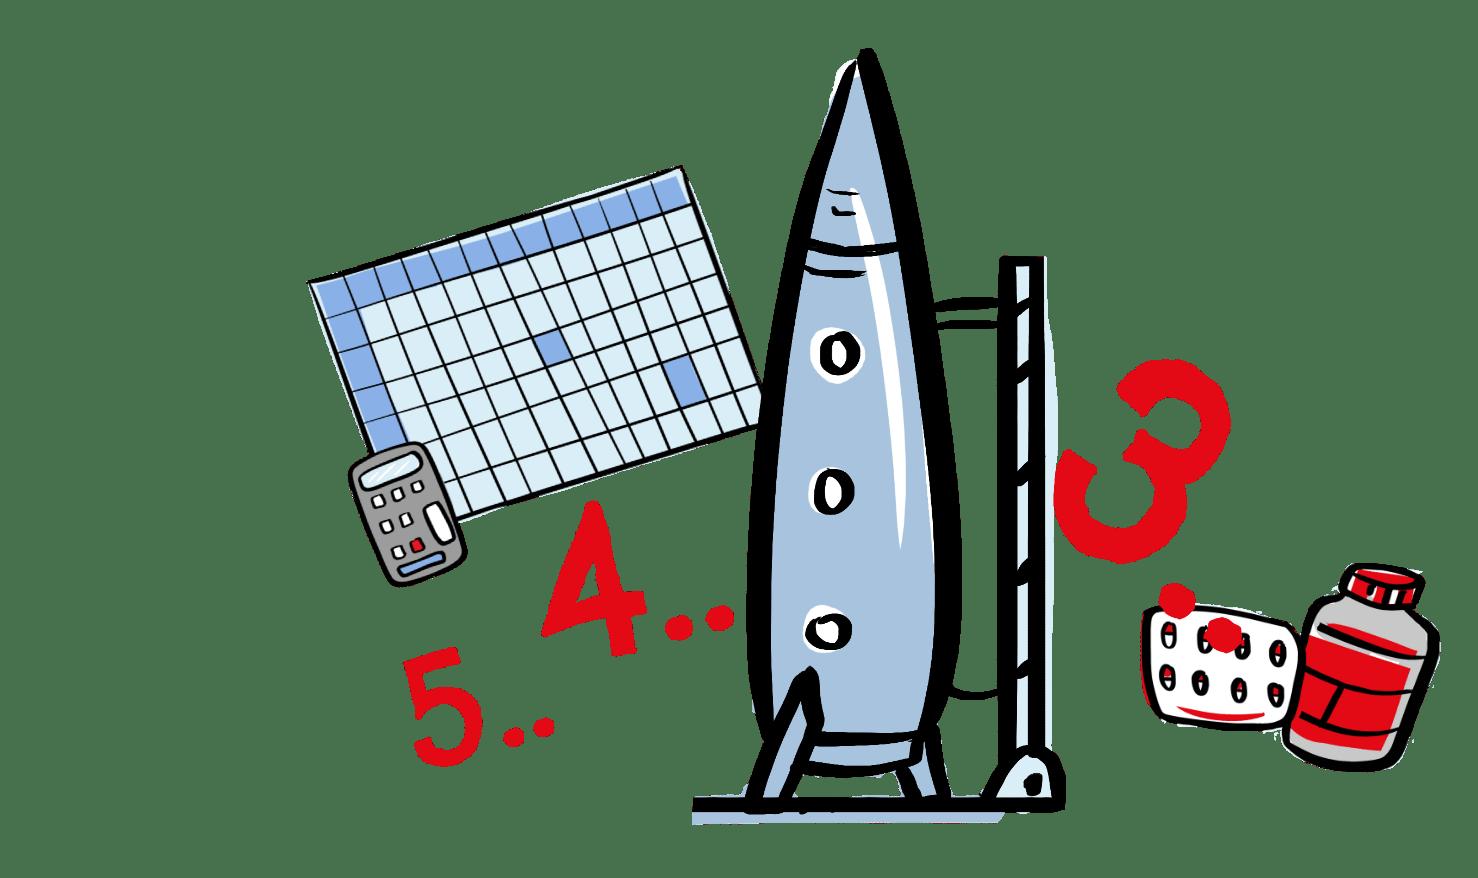 Rocket, pills and spreadsheet